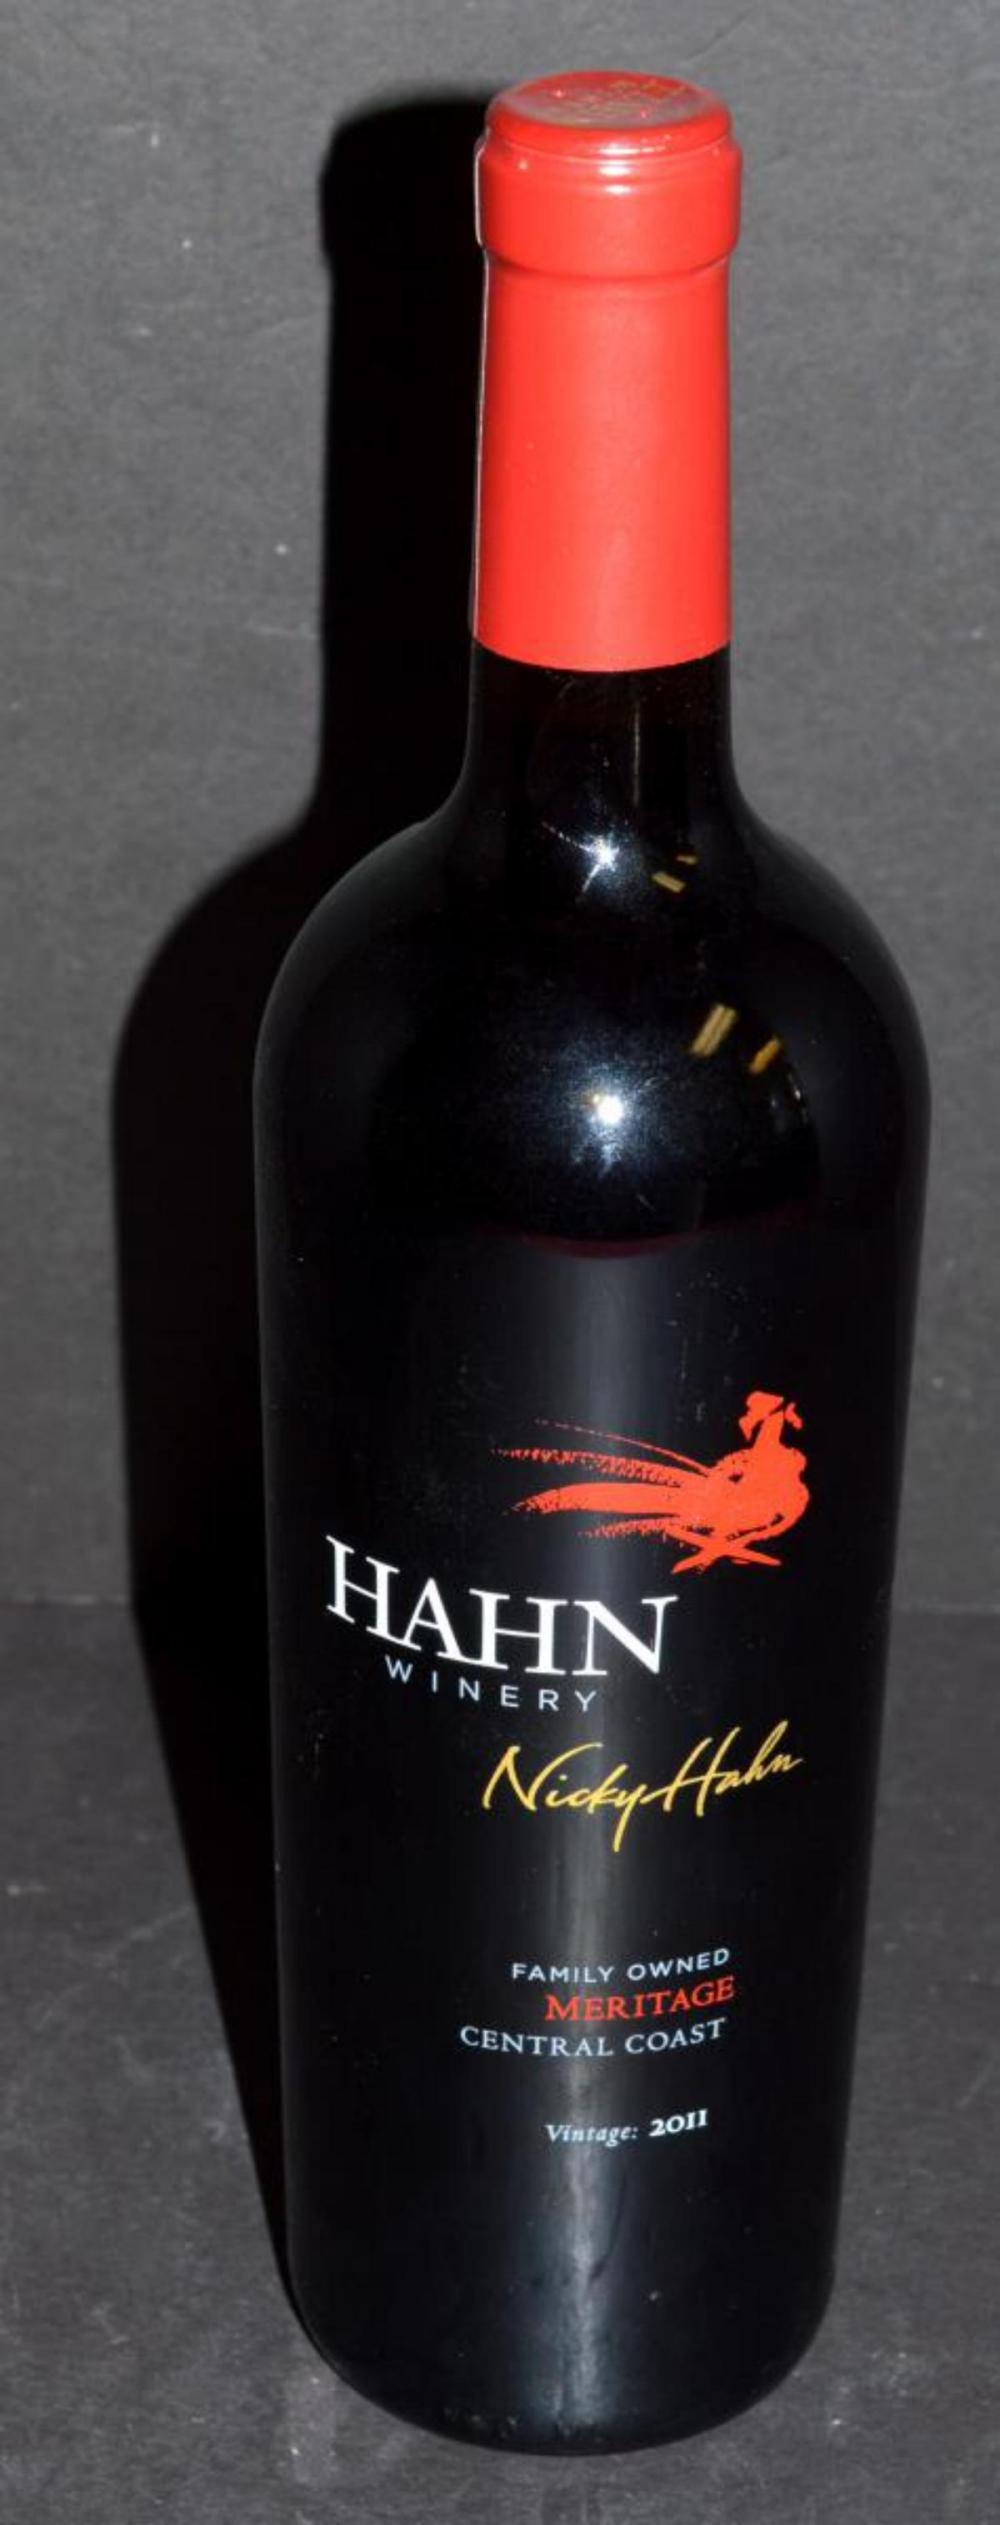 Hahn Winery Meritage 2011 Central Coast Wine